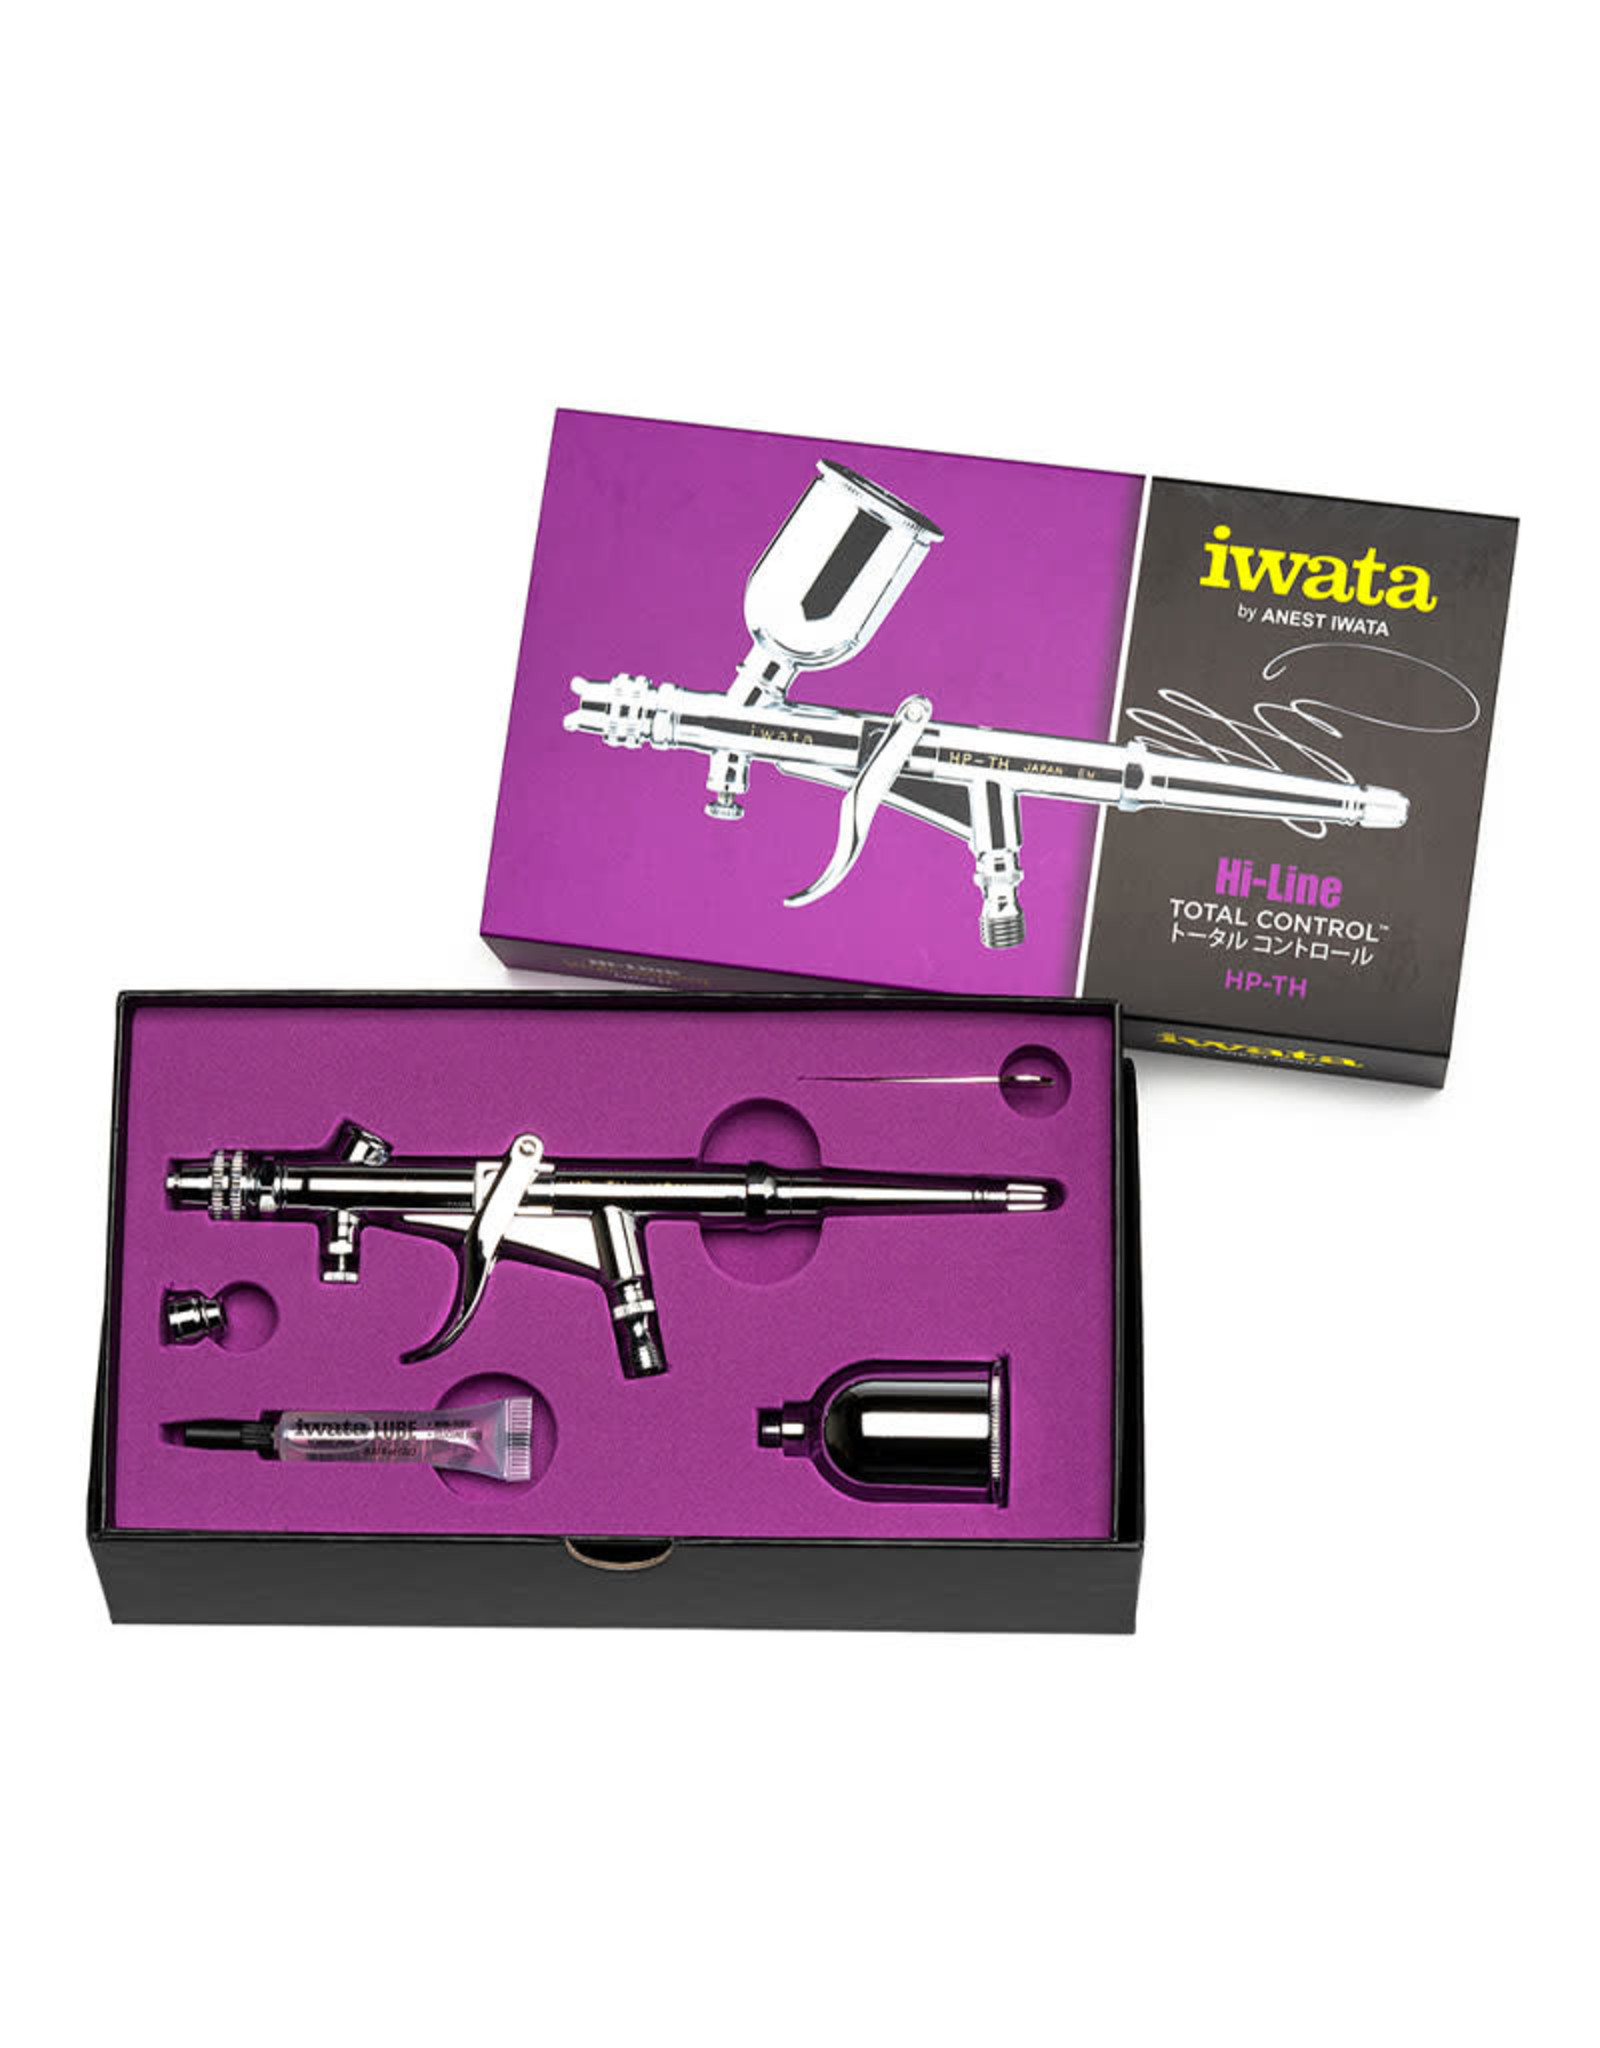 Iwata Iwata Hi-Line HP-TH Gravity Feed Dual Action Trigger Airbrush